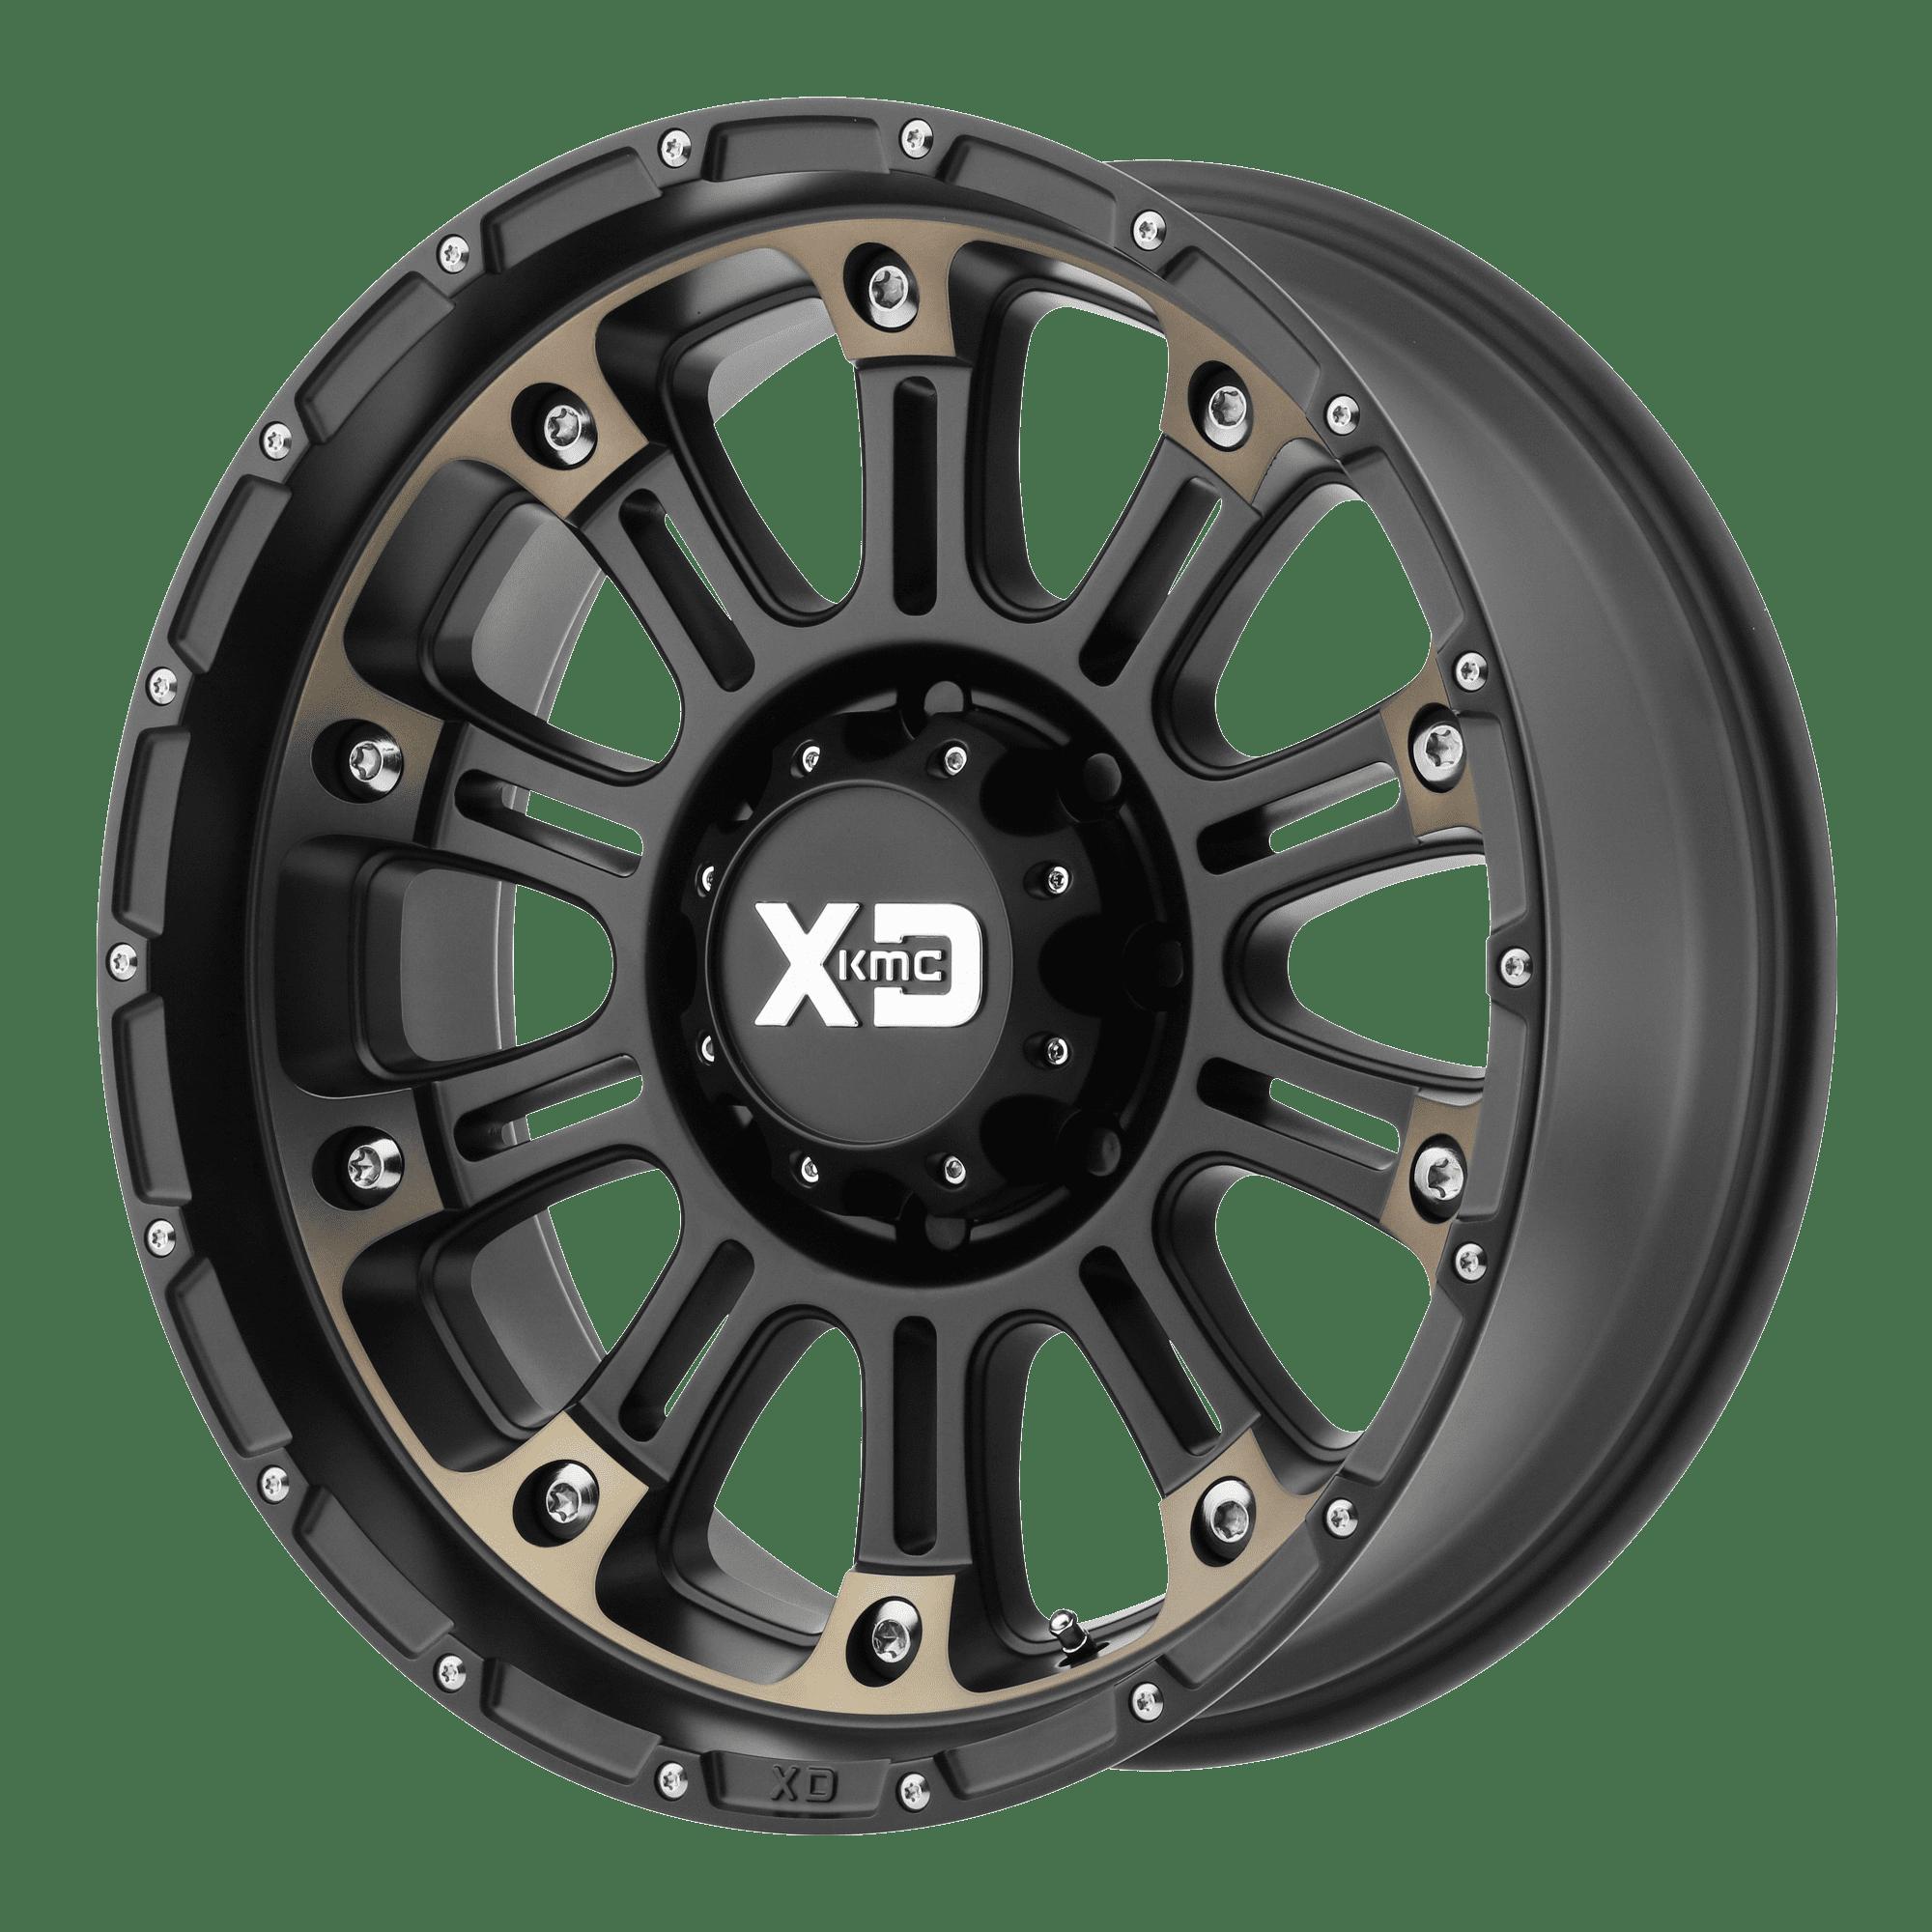 KMC-XD Wheels XD82929087912N XDWXD82929087912N HOSS 2 20x9 8x170.00 SATIN BLACK MACH W/ DARK TINT CLEAR COAT (-12 mm)